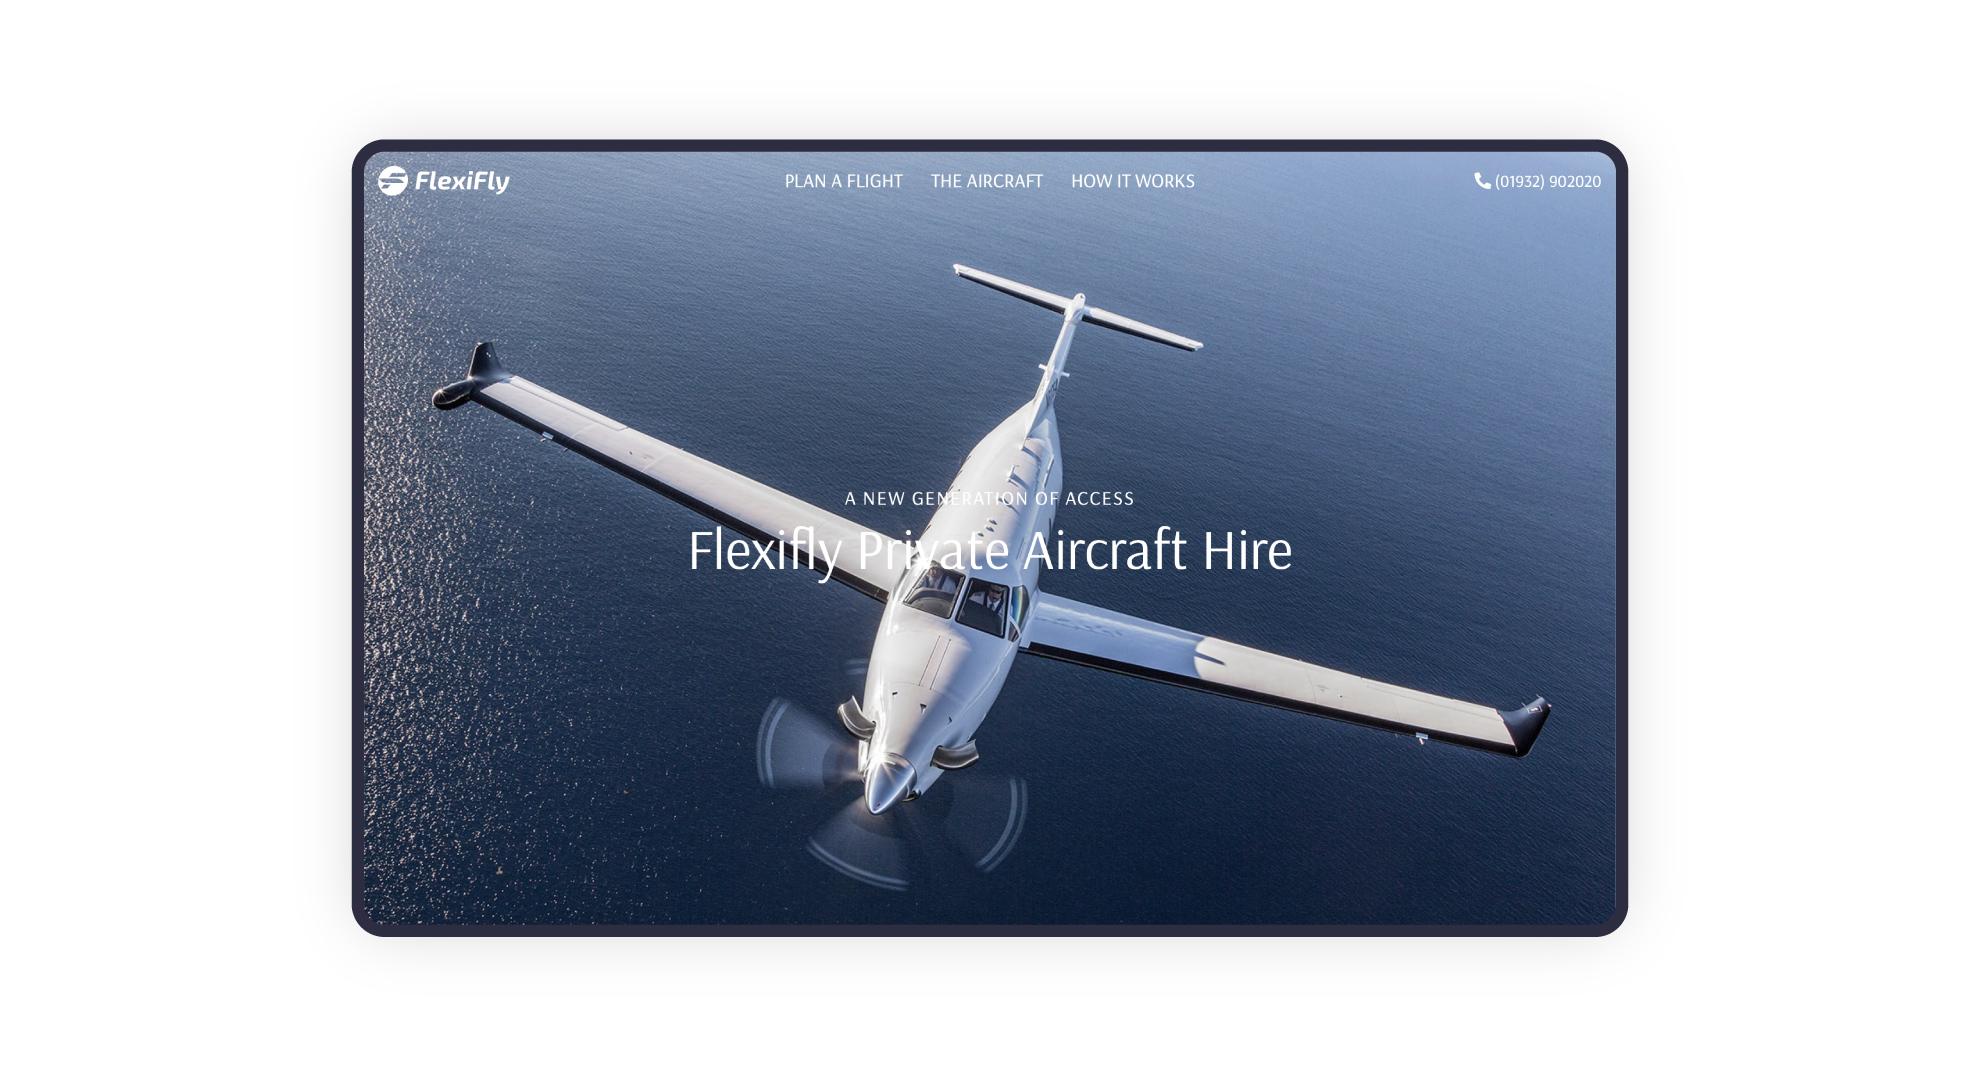 Website design for Flexifly aircraft hire